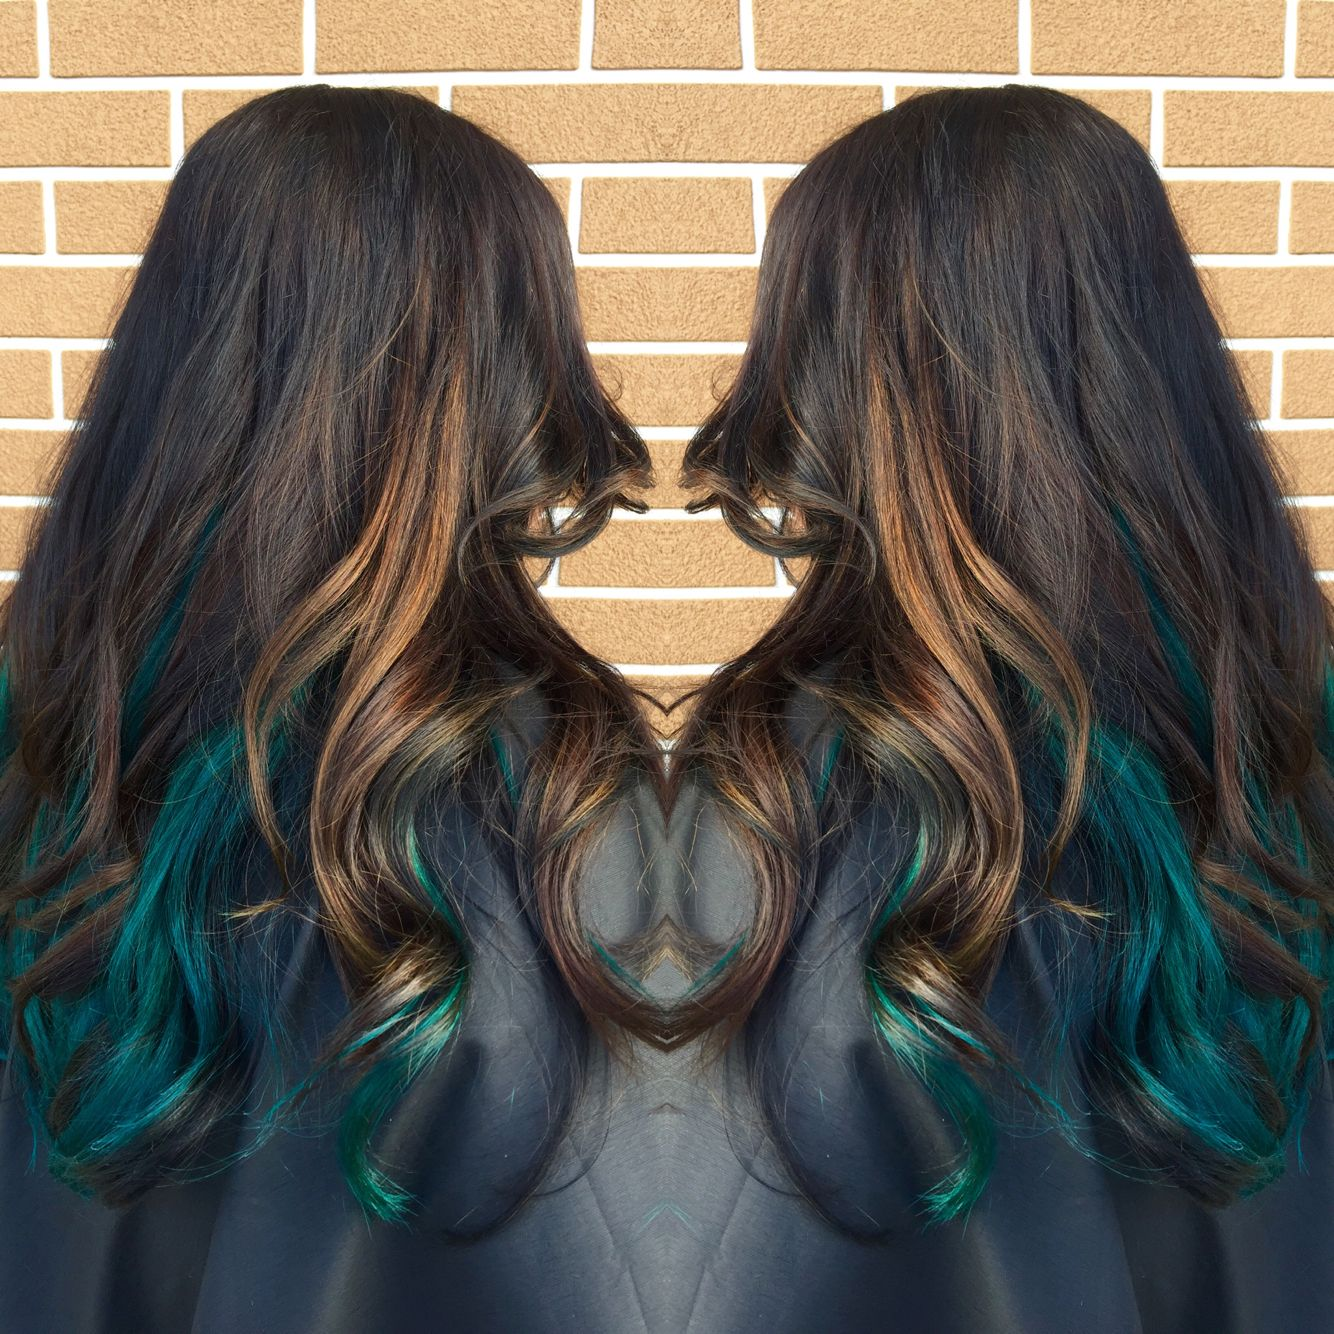 Teal hair teal peekaboo pravana green blue balayage caramel hair